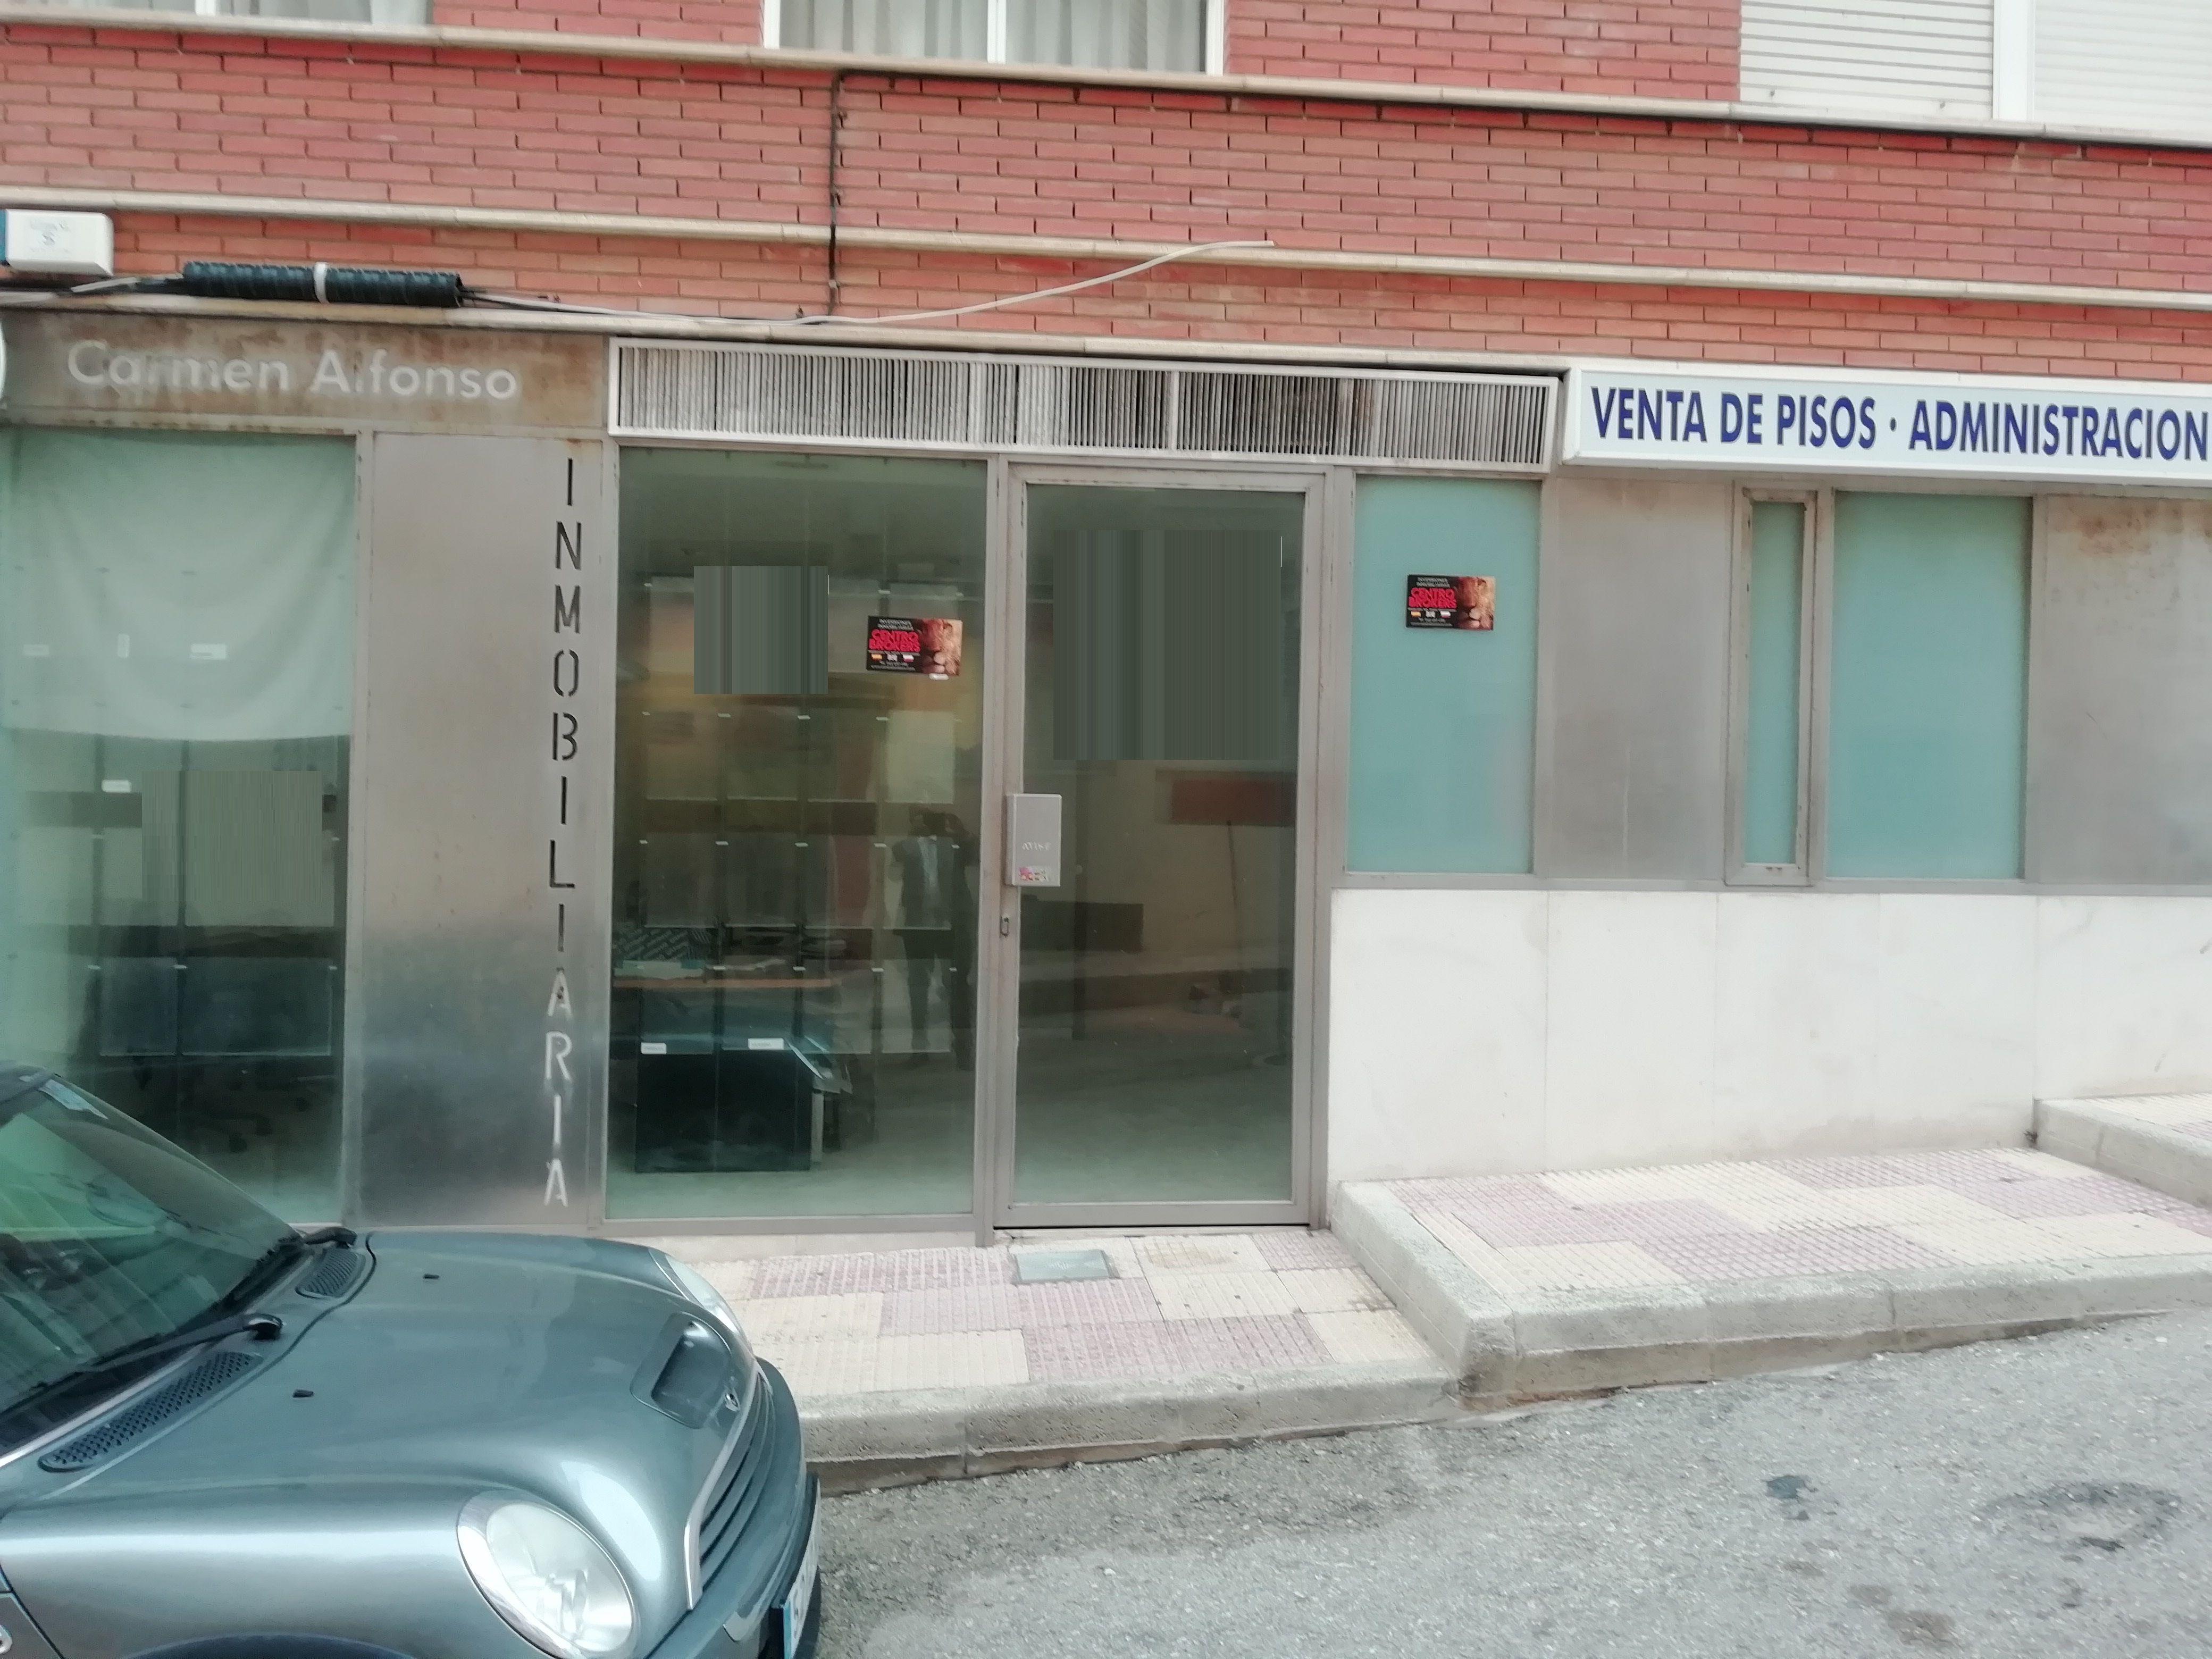 Oficina  Cullera - sant antoni. Estupendo despacho profesional en venta